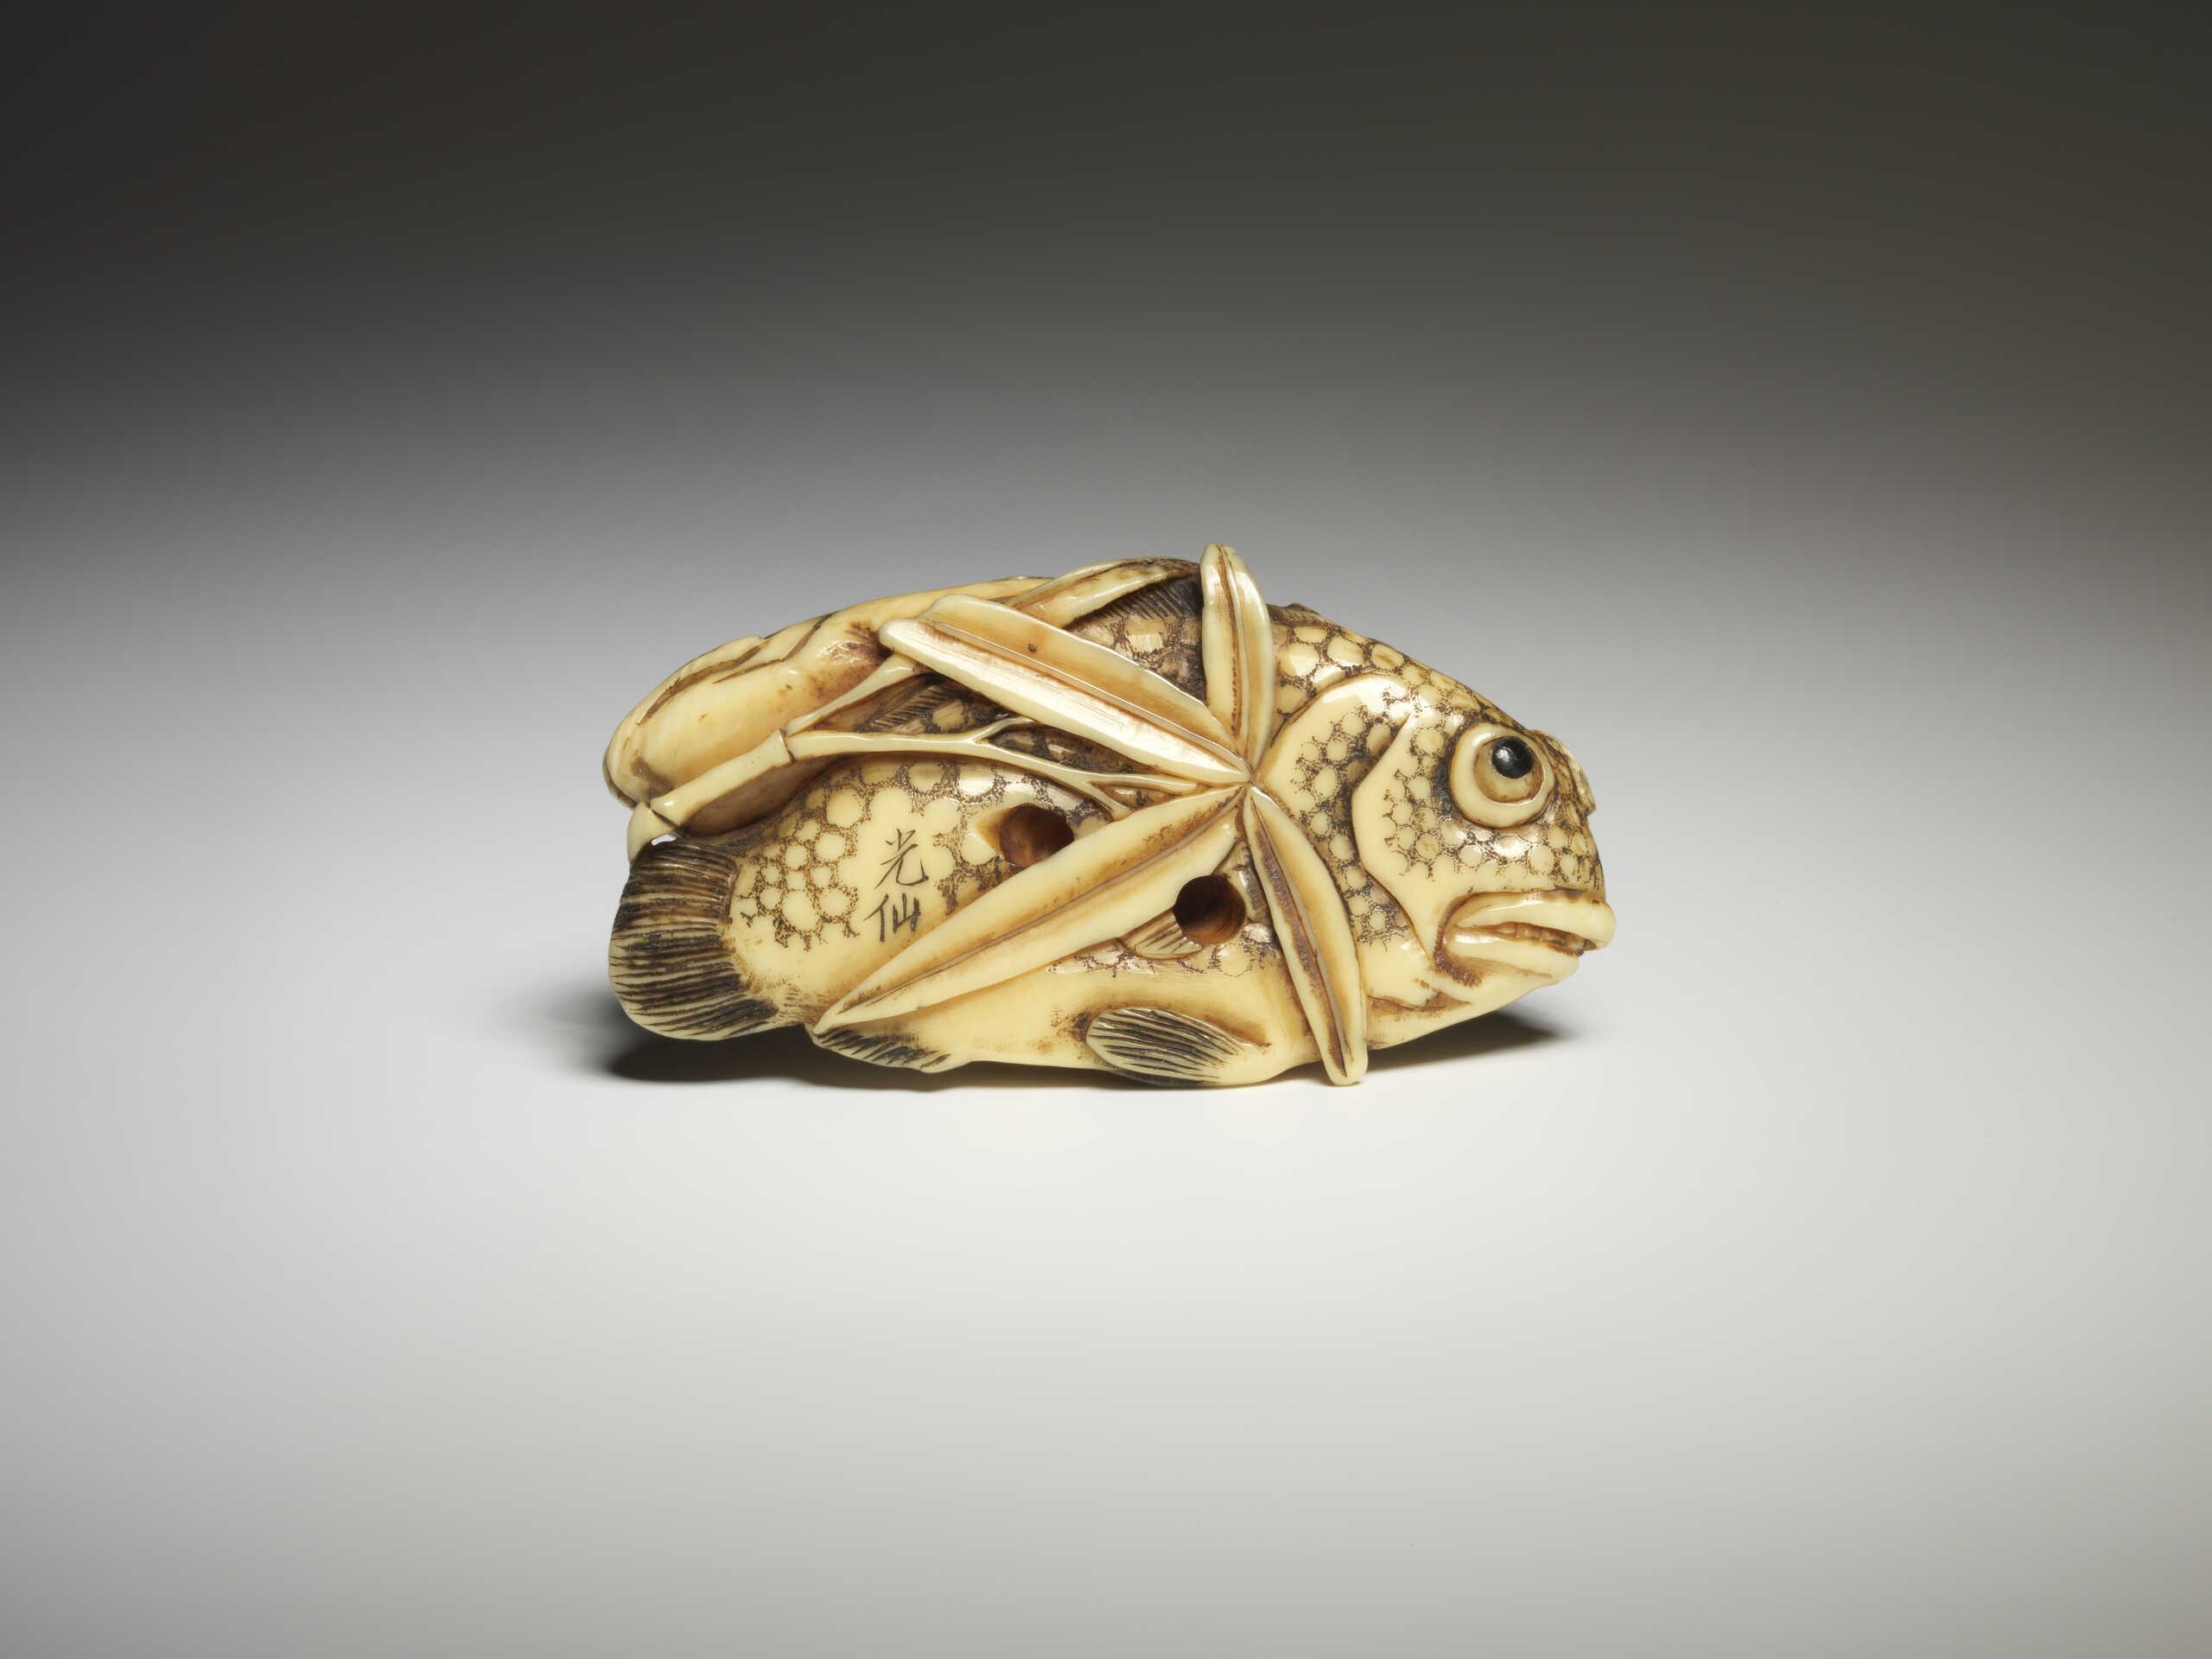 Kosen ivory fish netsuke 3